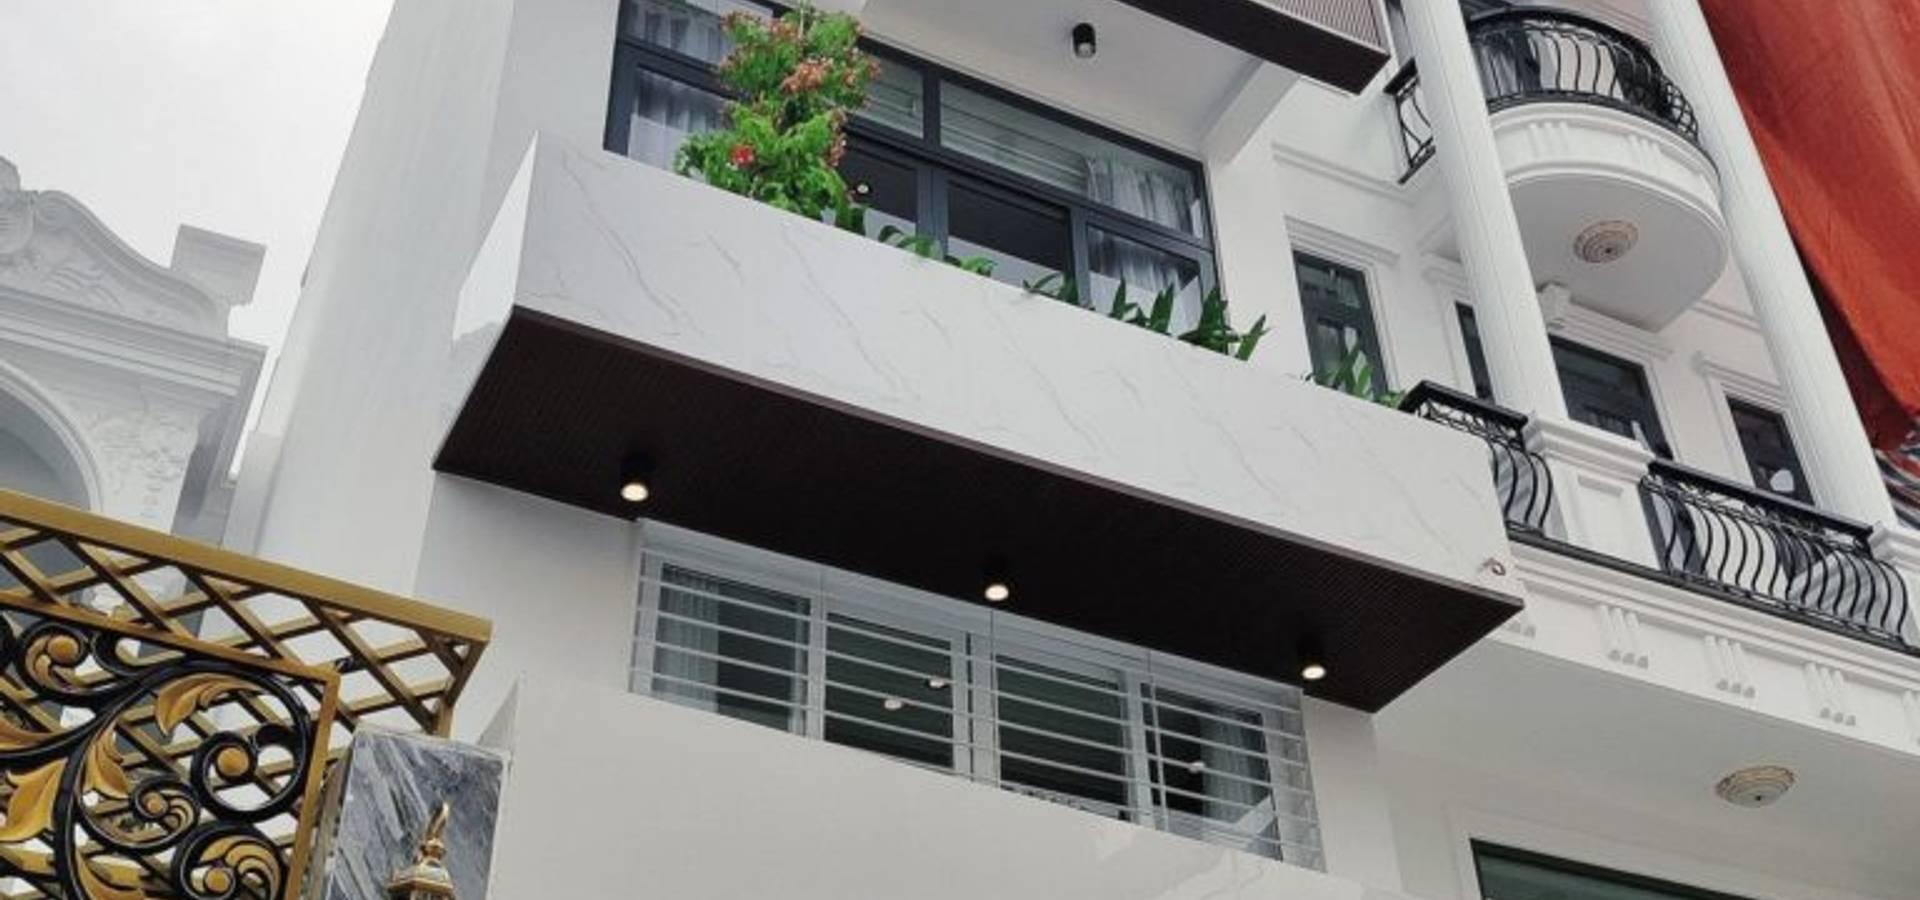 AN PHÚ DESIGN & BUILD